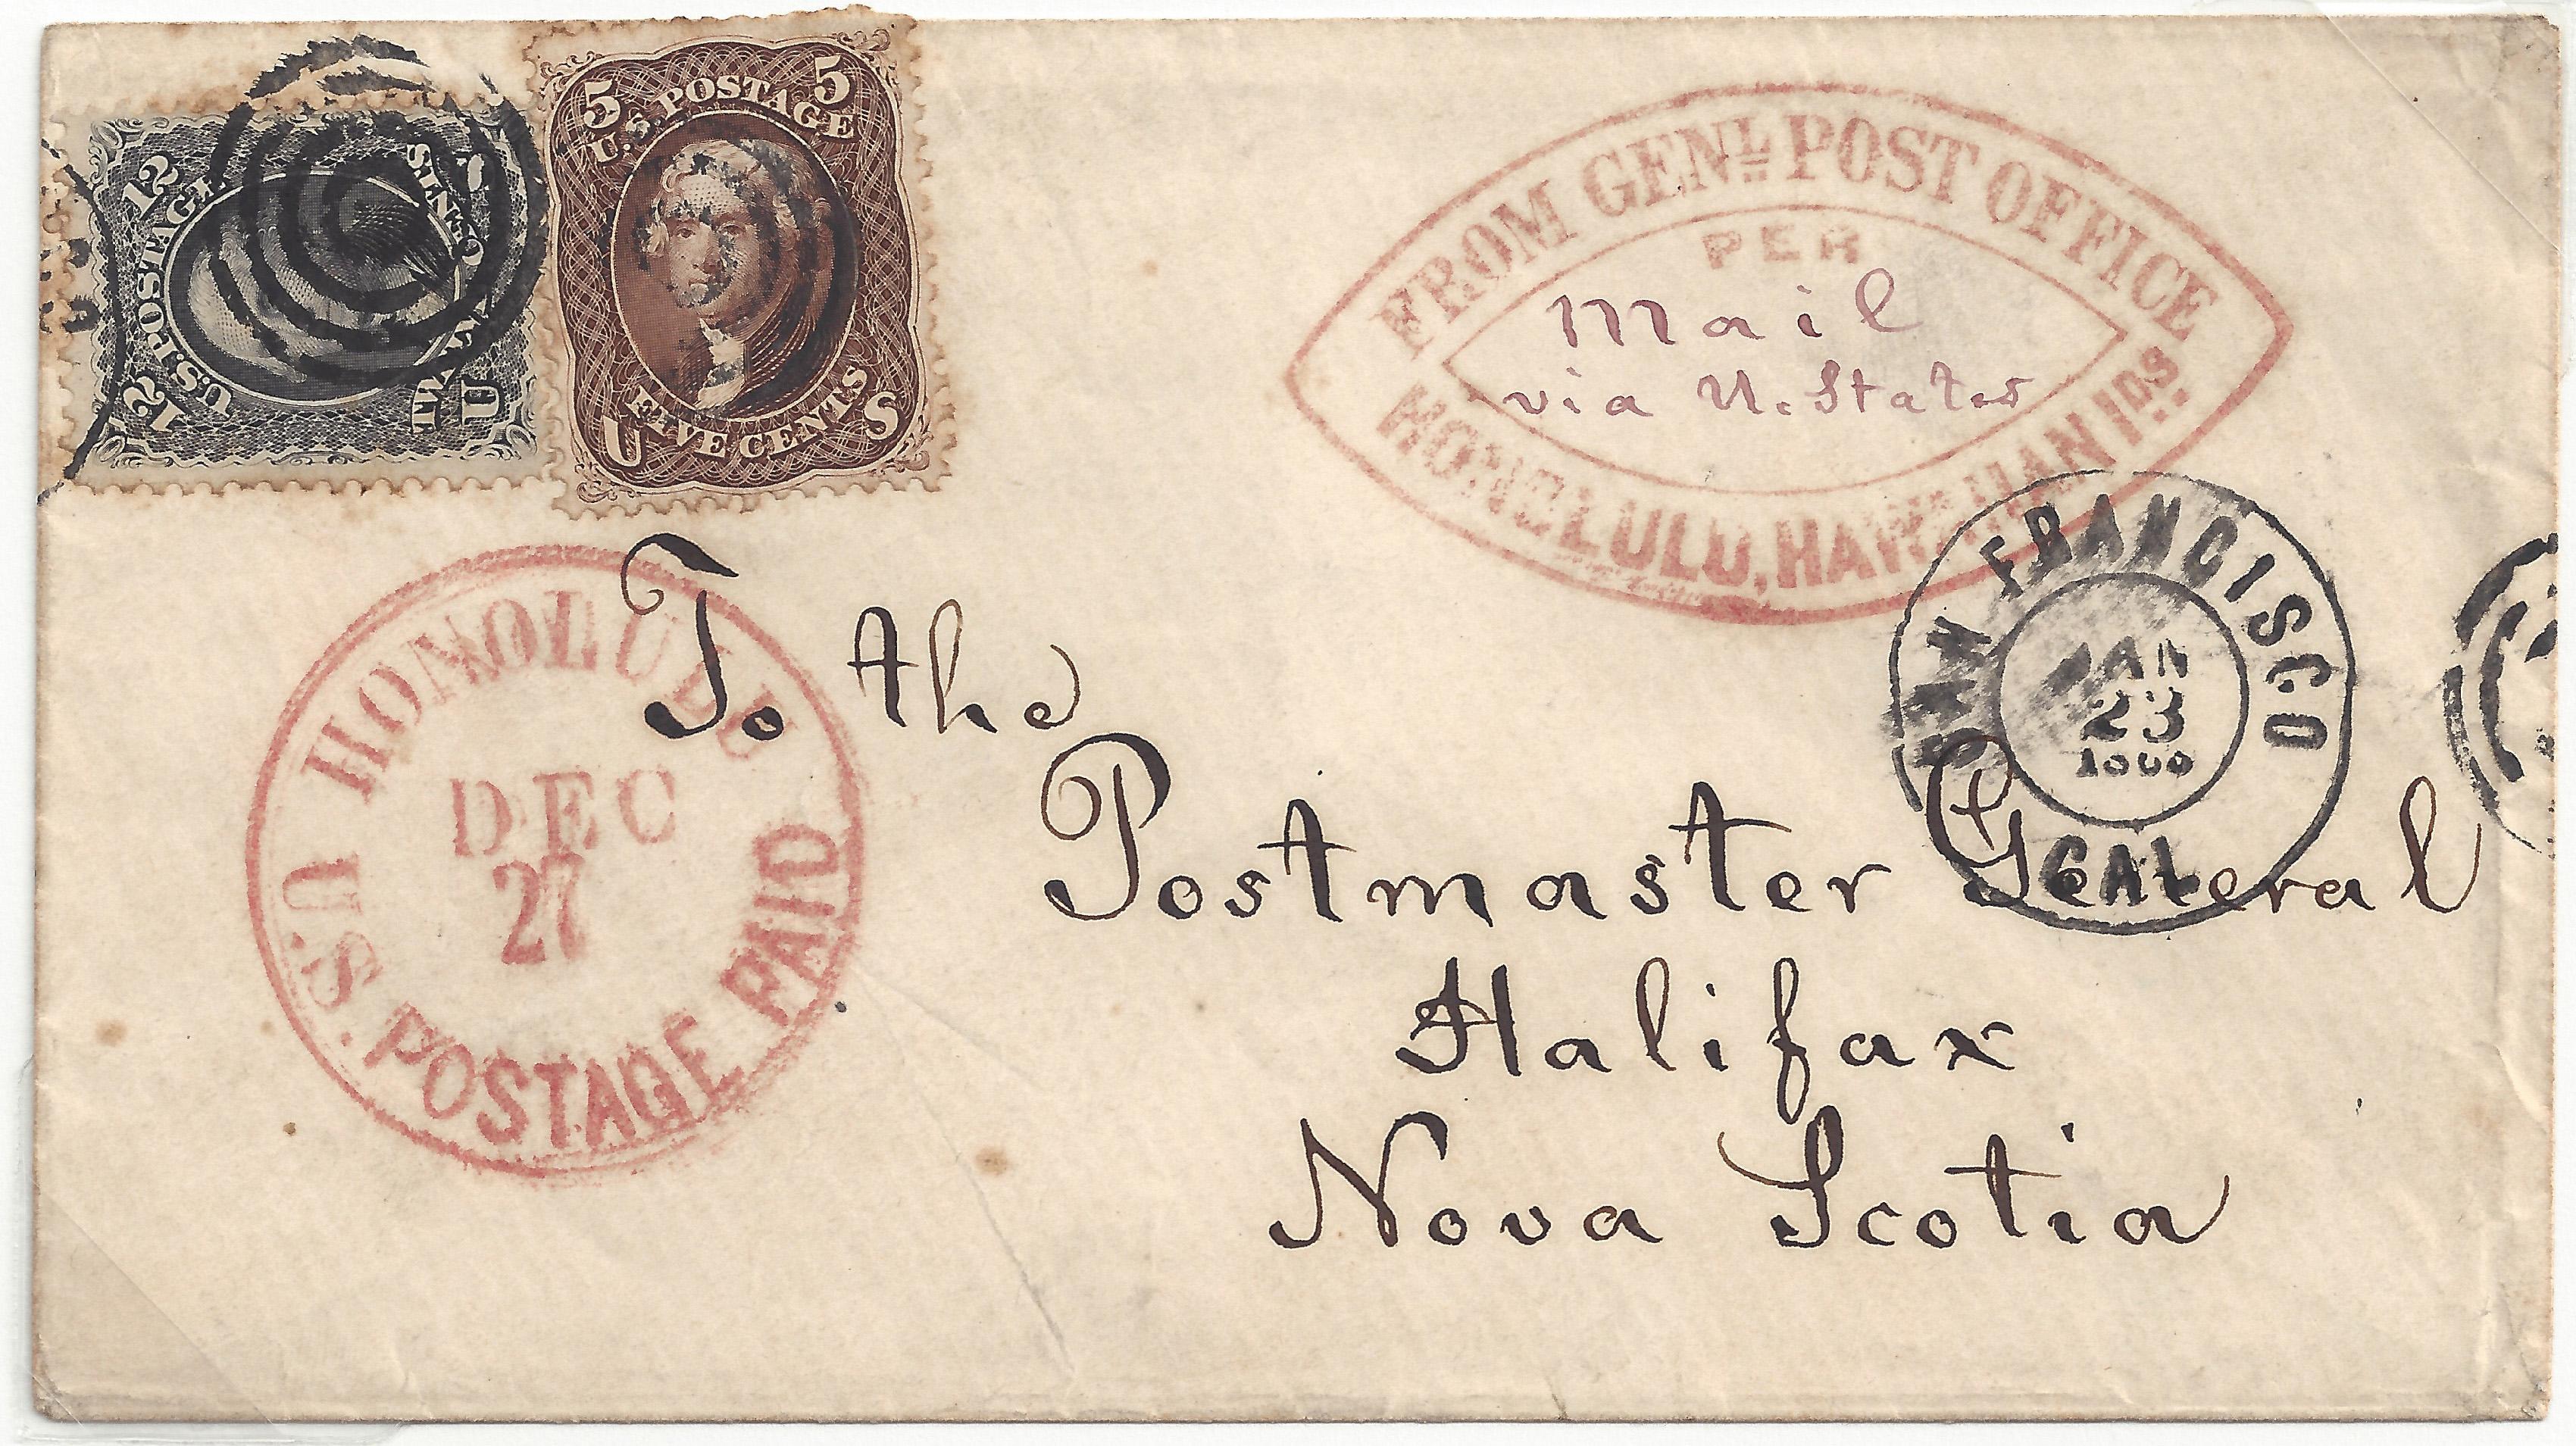 Suburban 20141115 5 024B Honolulu Dec 27 1864 General Post Offfice Honolulu Hs (69 76)